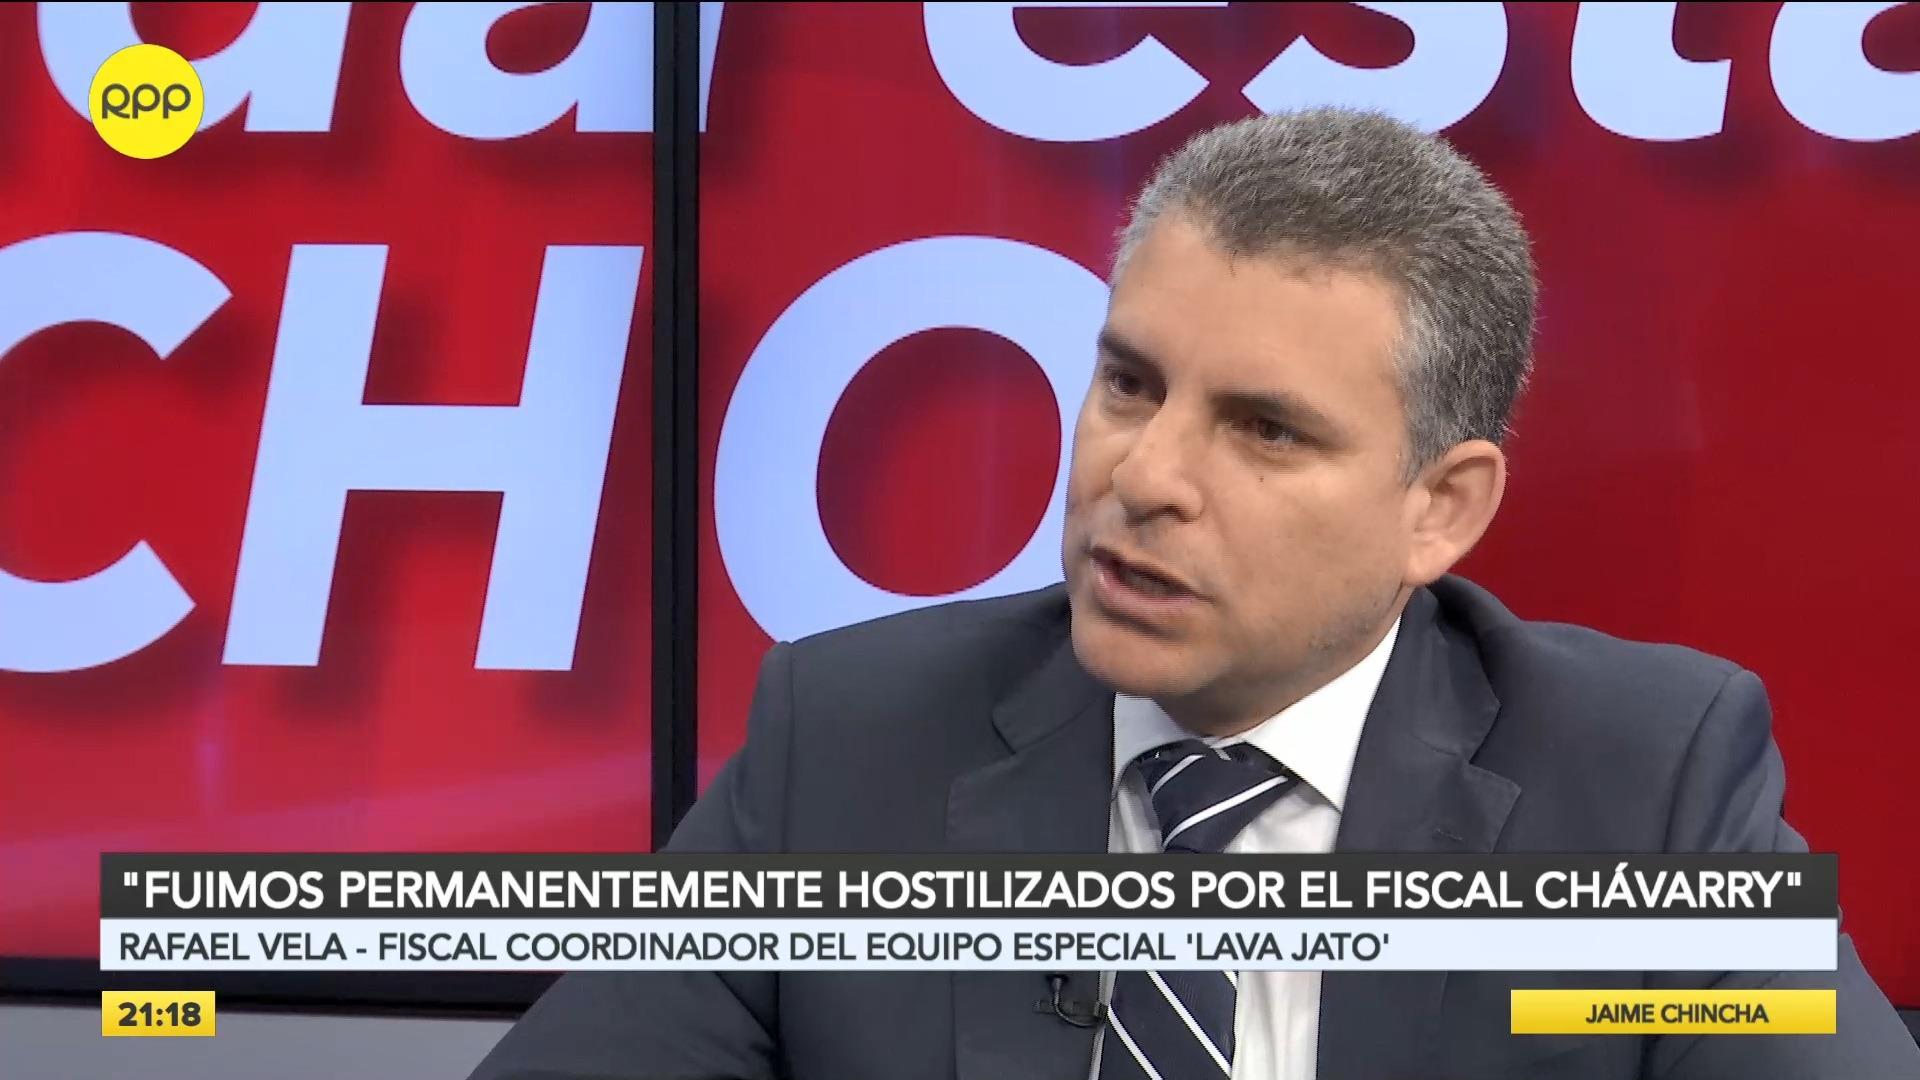 El fiscal coordinador del Equipo Especial Lava Jato se pronunció sobre la medida judicial a favor de Cuba y Luyo.